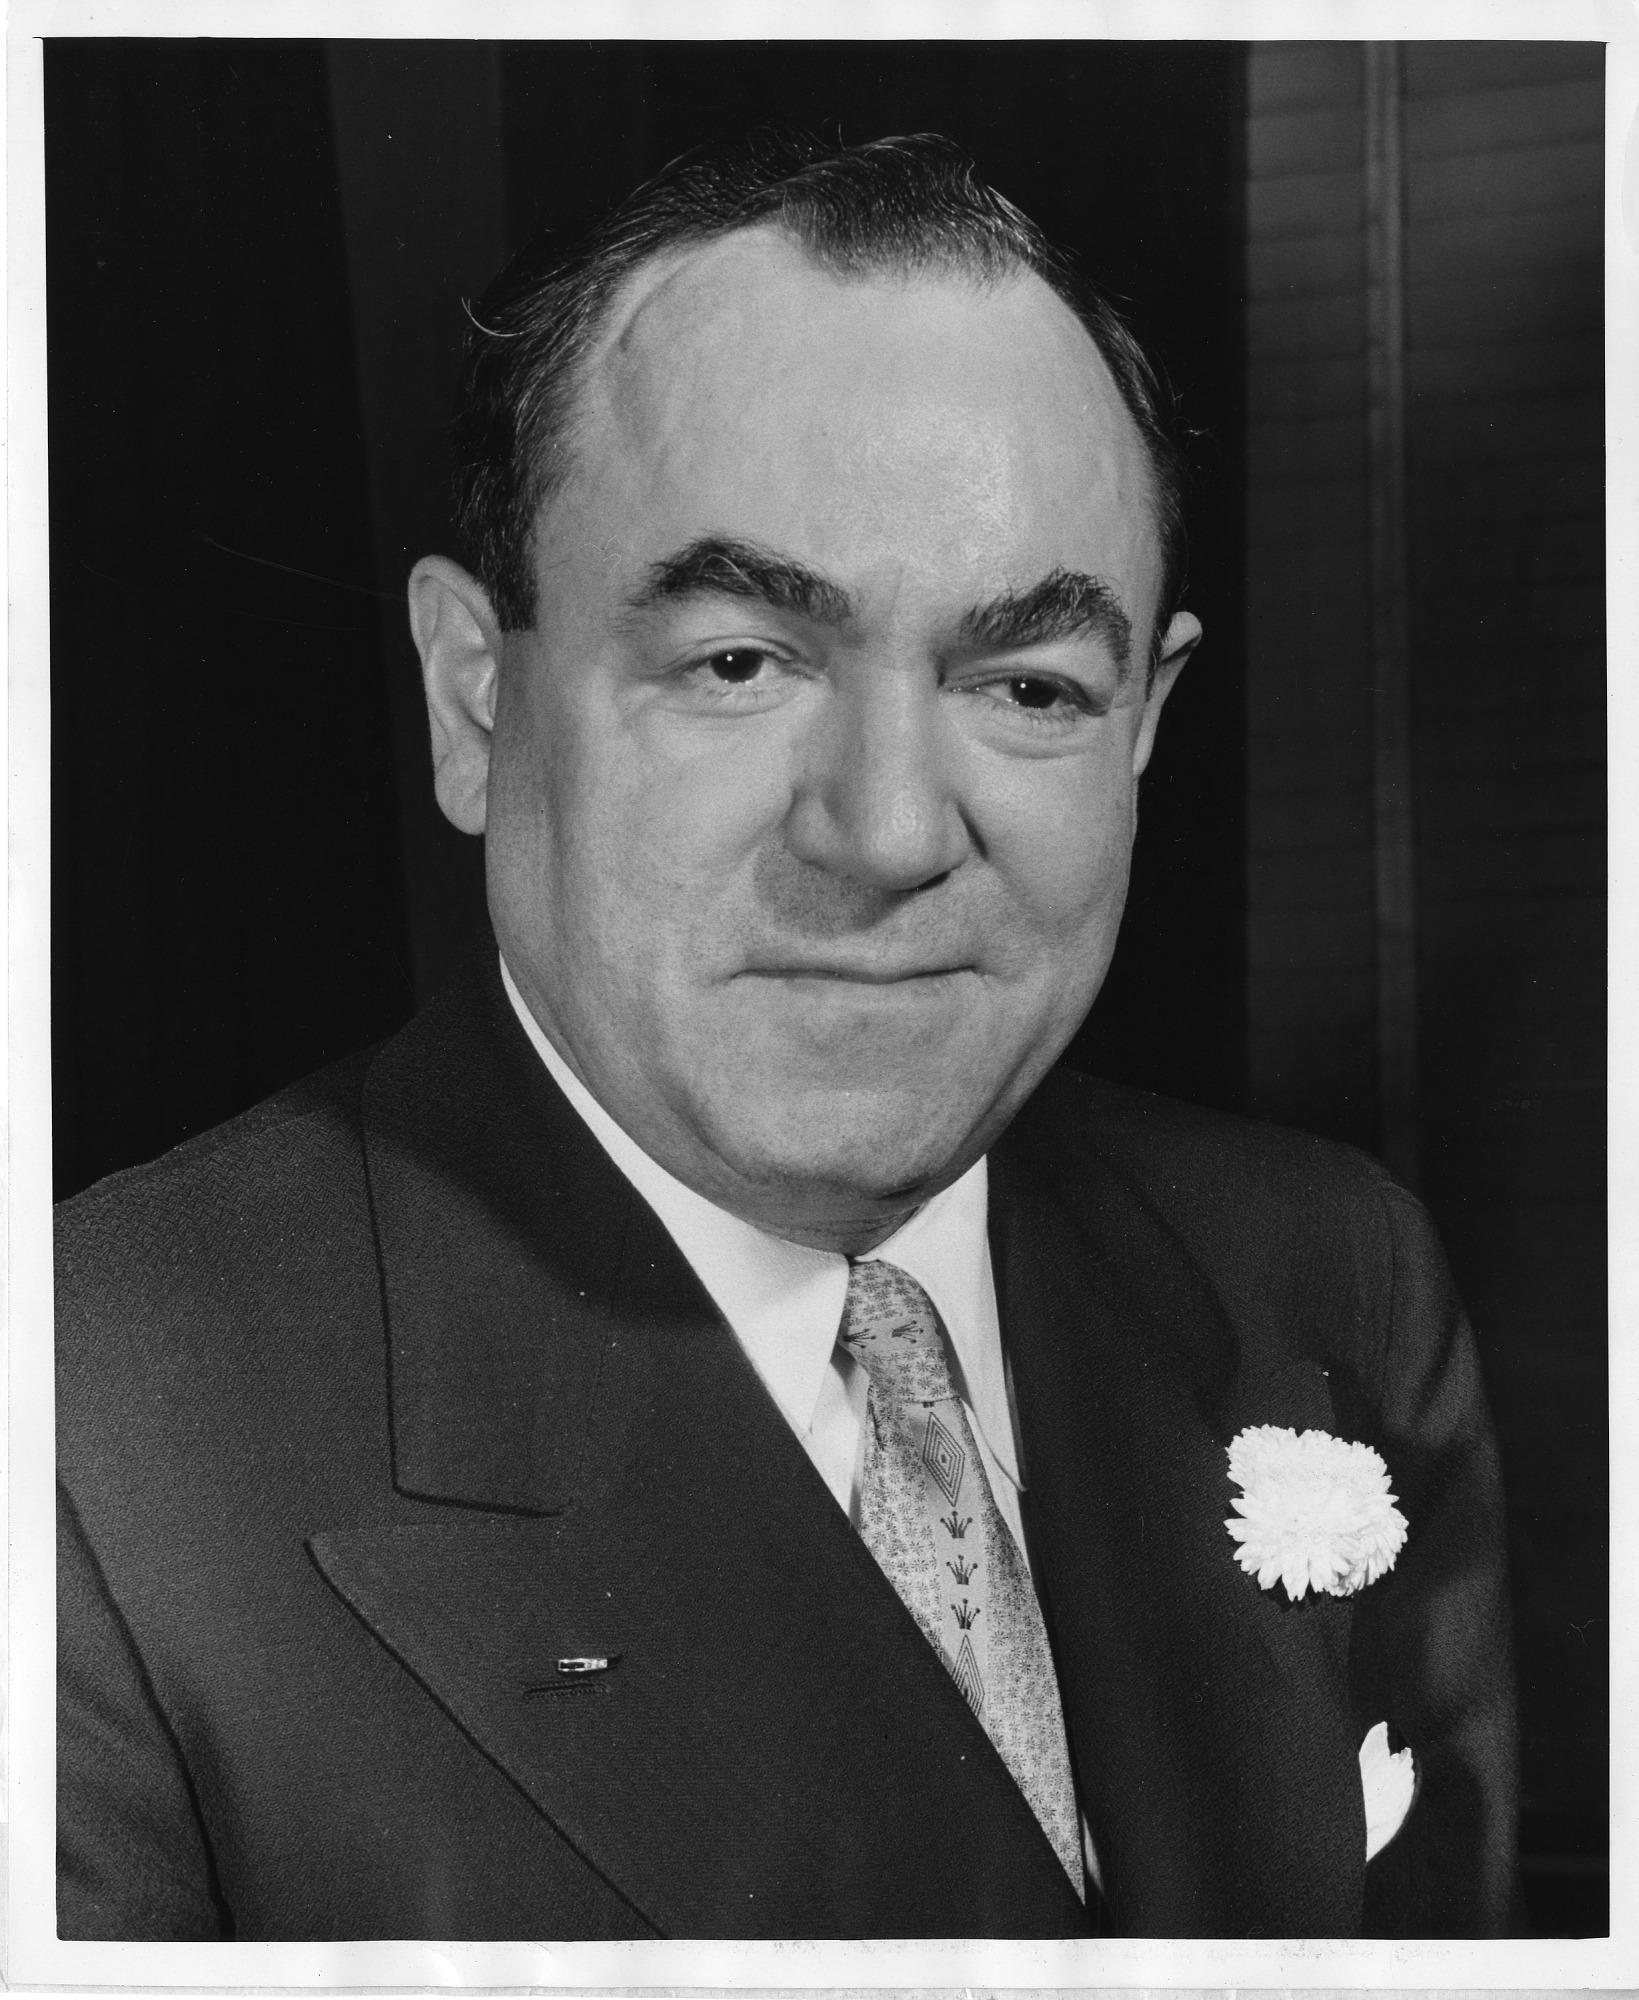 H. Boris Burns (1900-1965), Smithsonian Institution Archives, SIA Acc. 90-105 [SIA2008-0080].